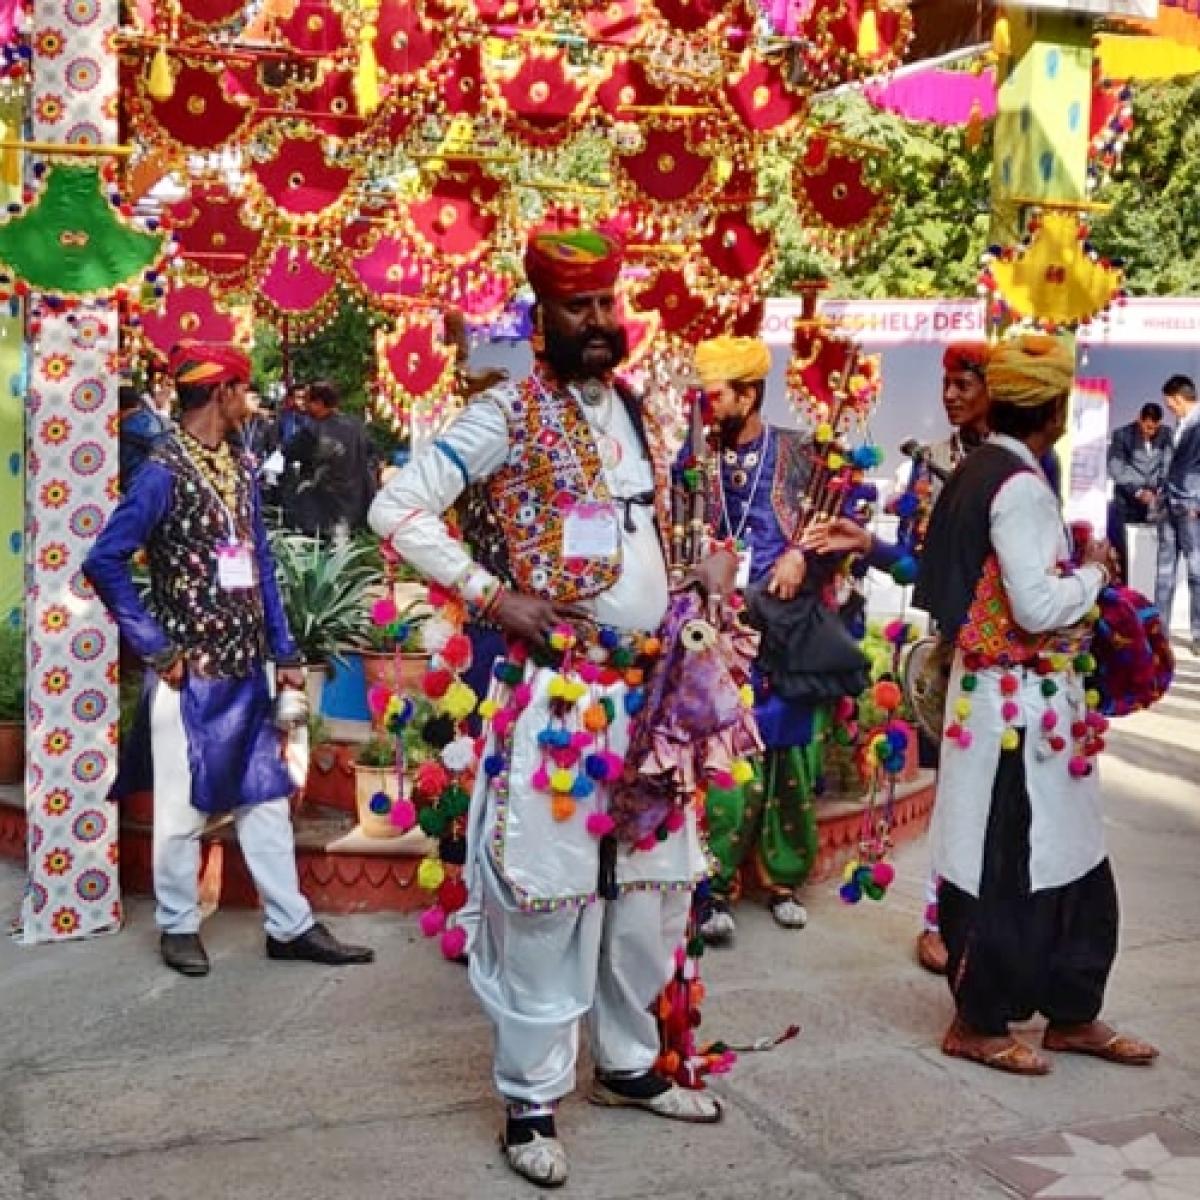 Zee Jaipur Literature Festival 2020: The IPL of book fests kicks off